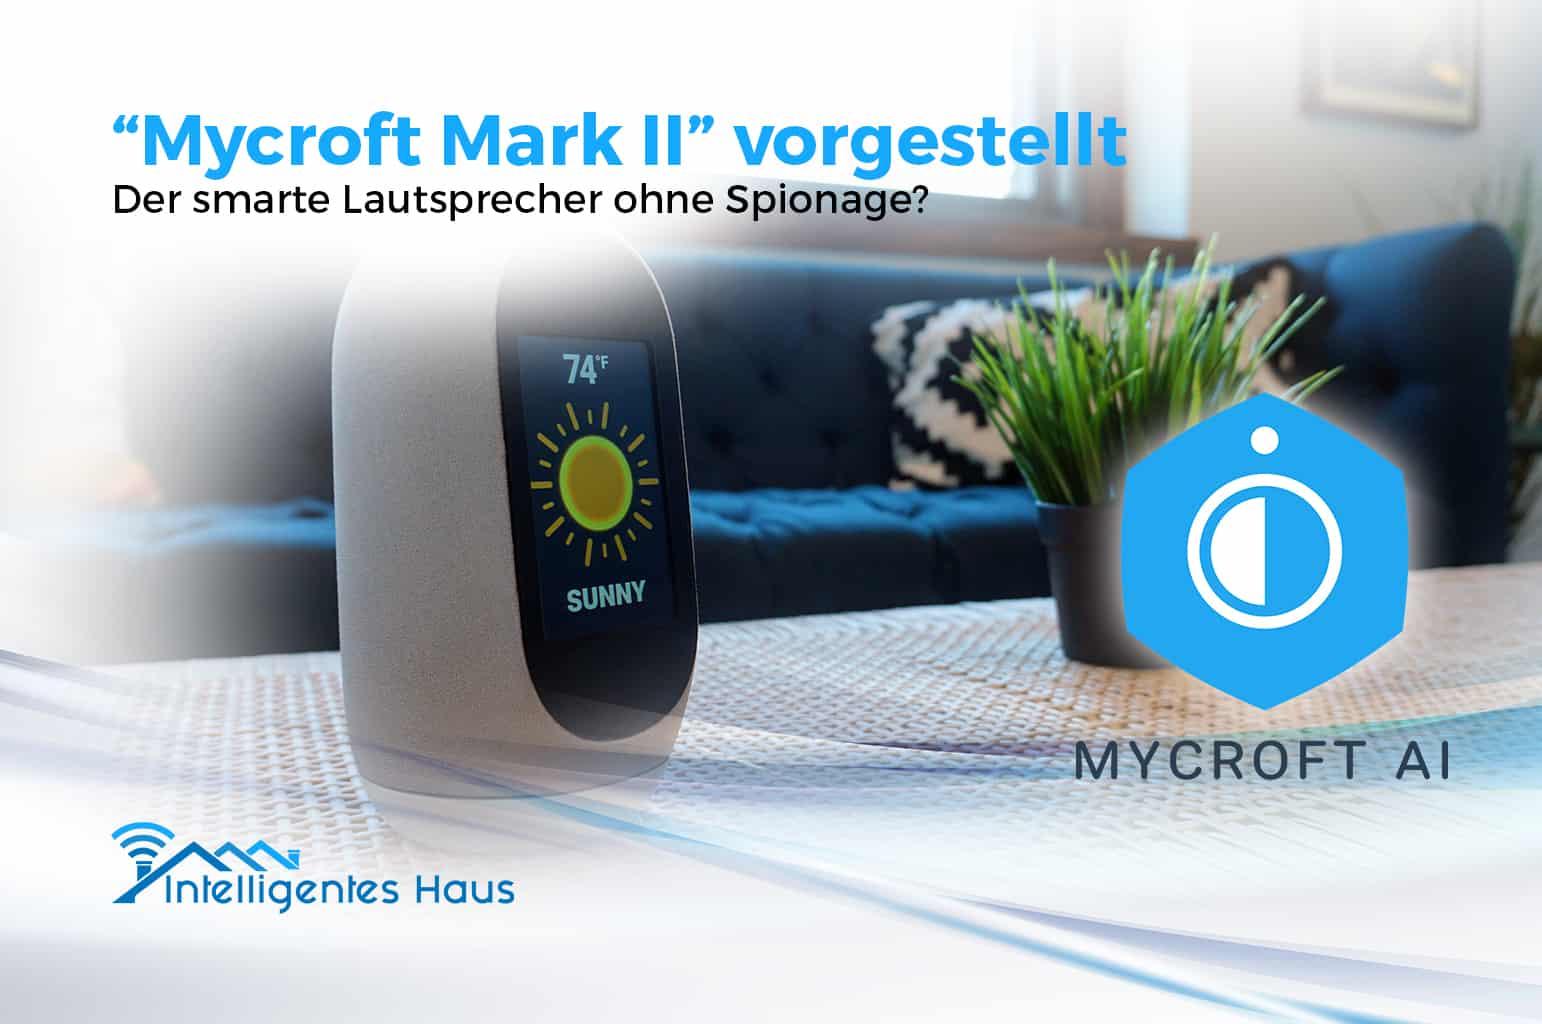 mycroft mark ii neuer smart home lautsprecher ohne datensammlung. Black Bedroom Furniture Sets. Home Design Ideas